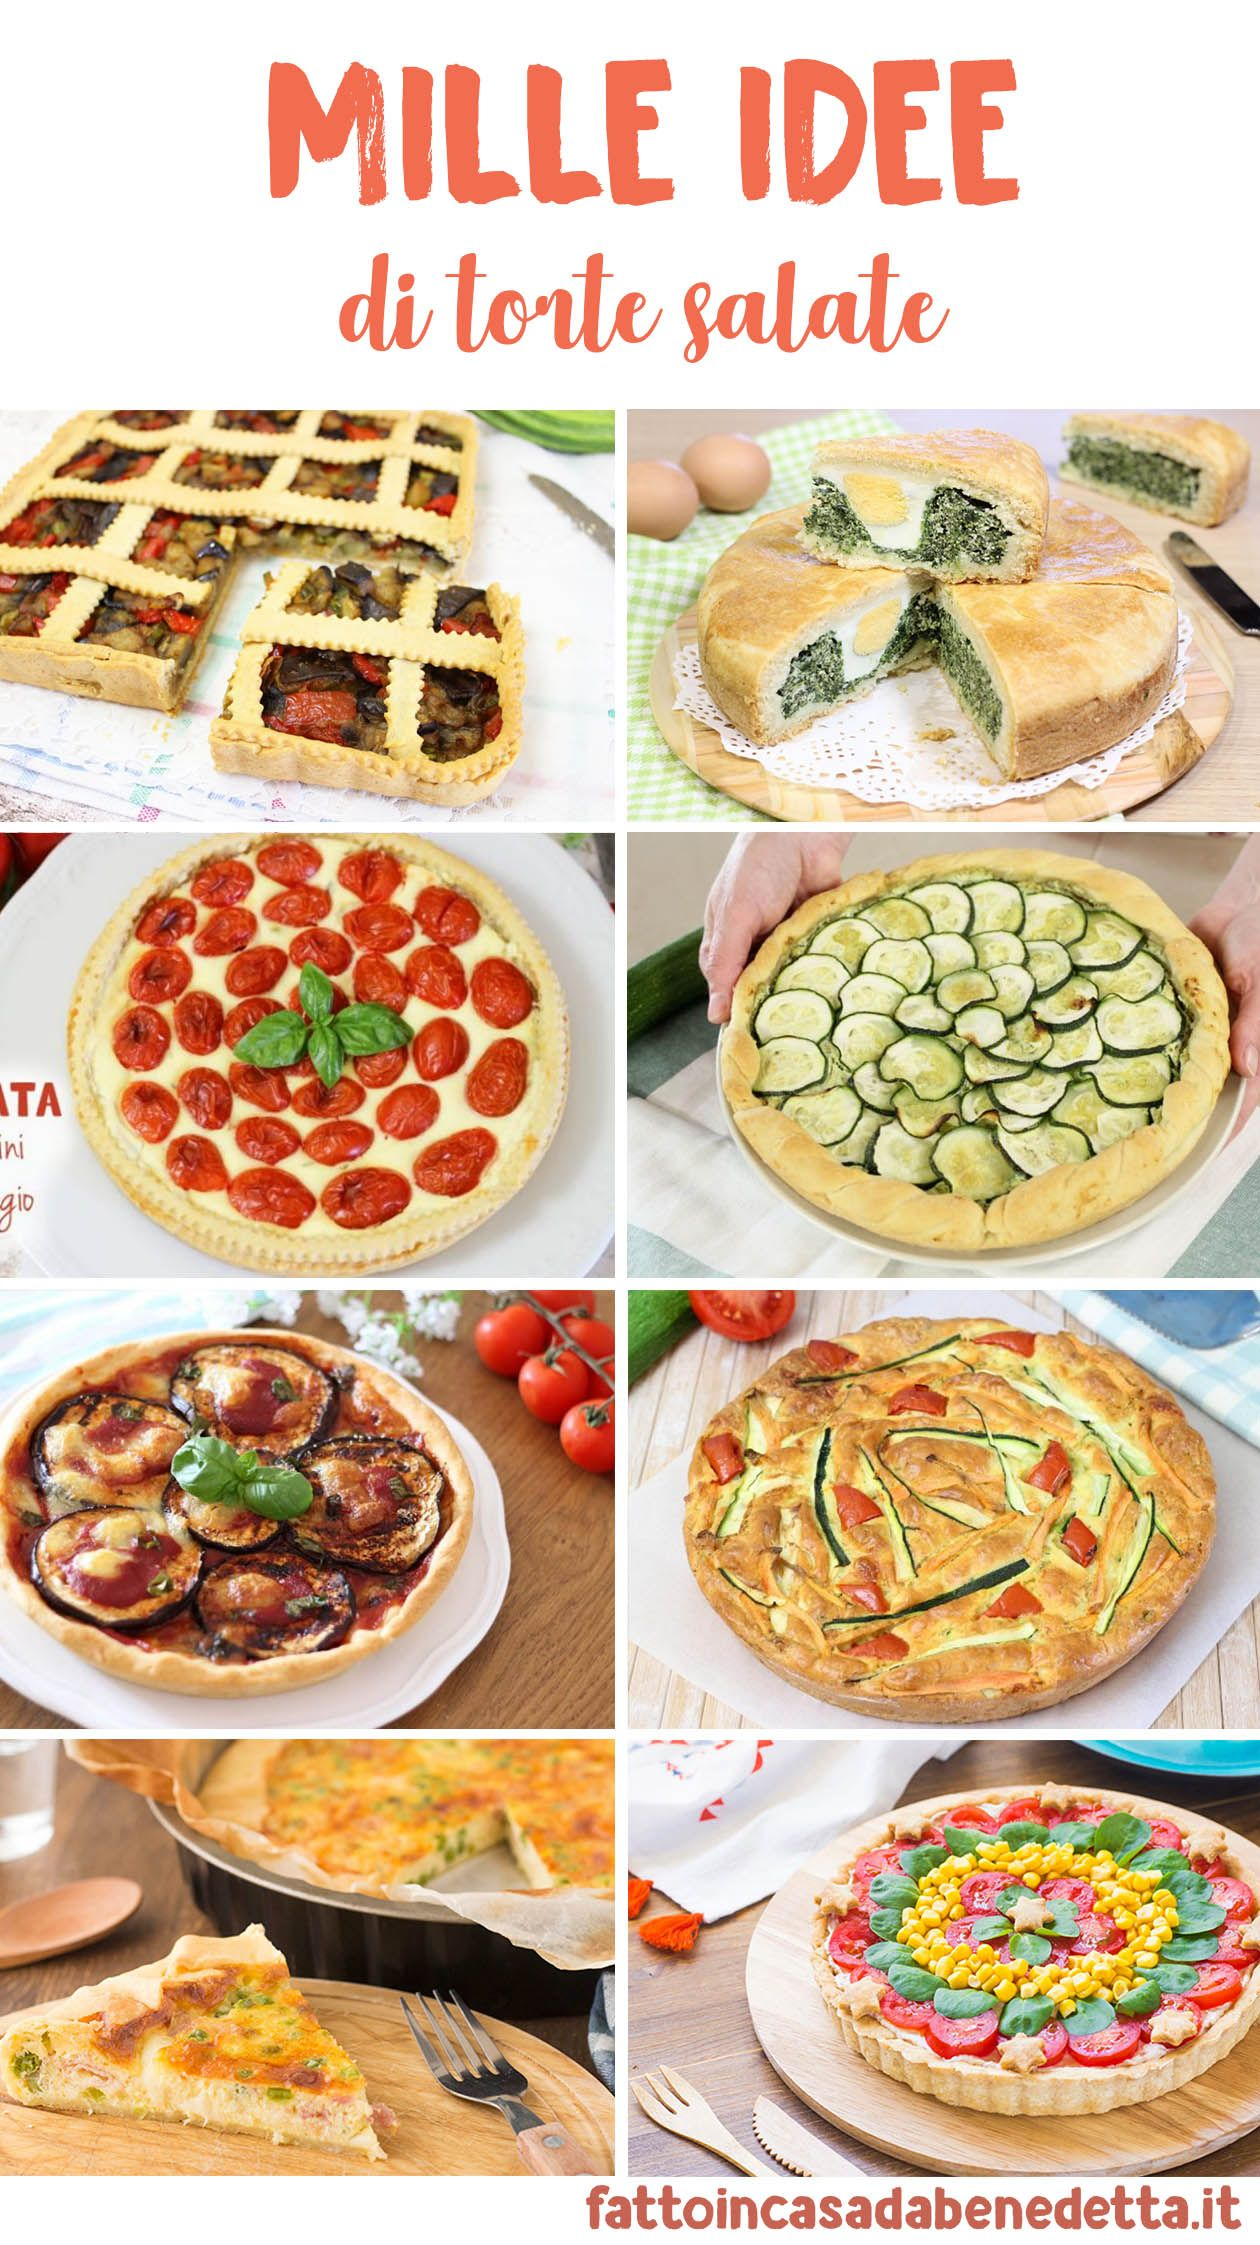 5911ff092de23b17c01b018a61f745ce - Ricette Fatto In Casa Da Benedetta